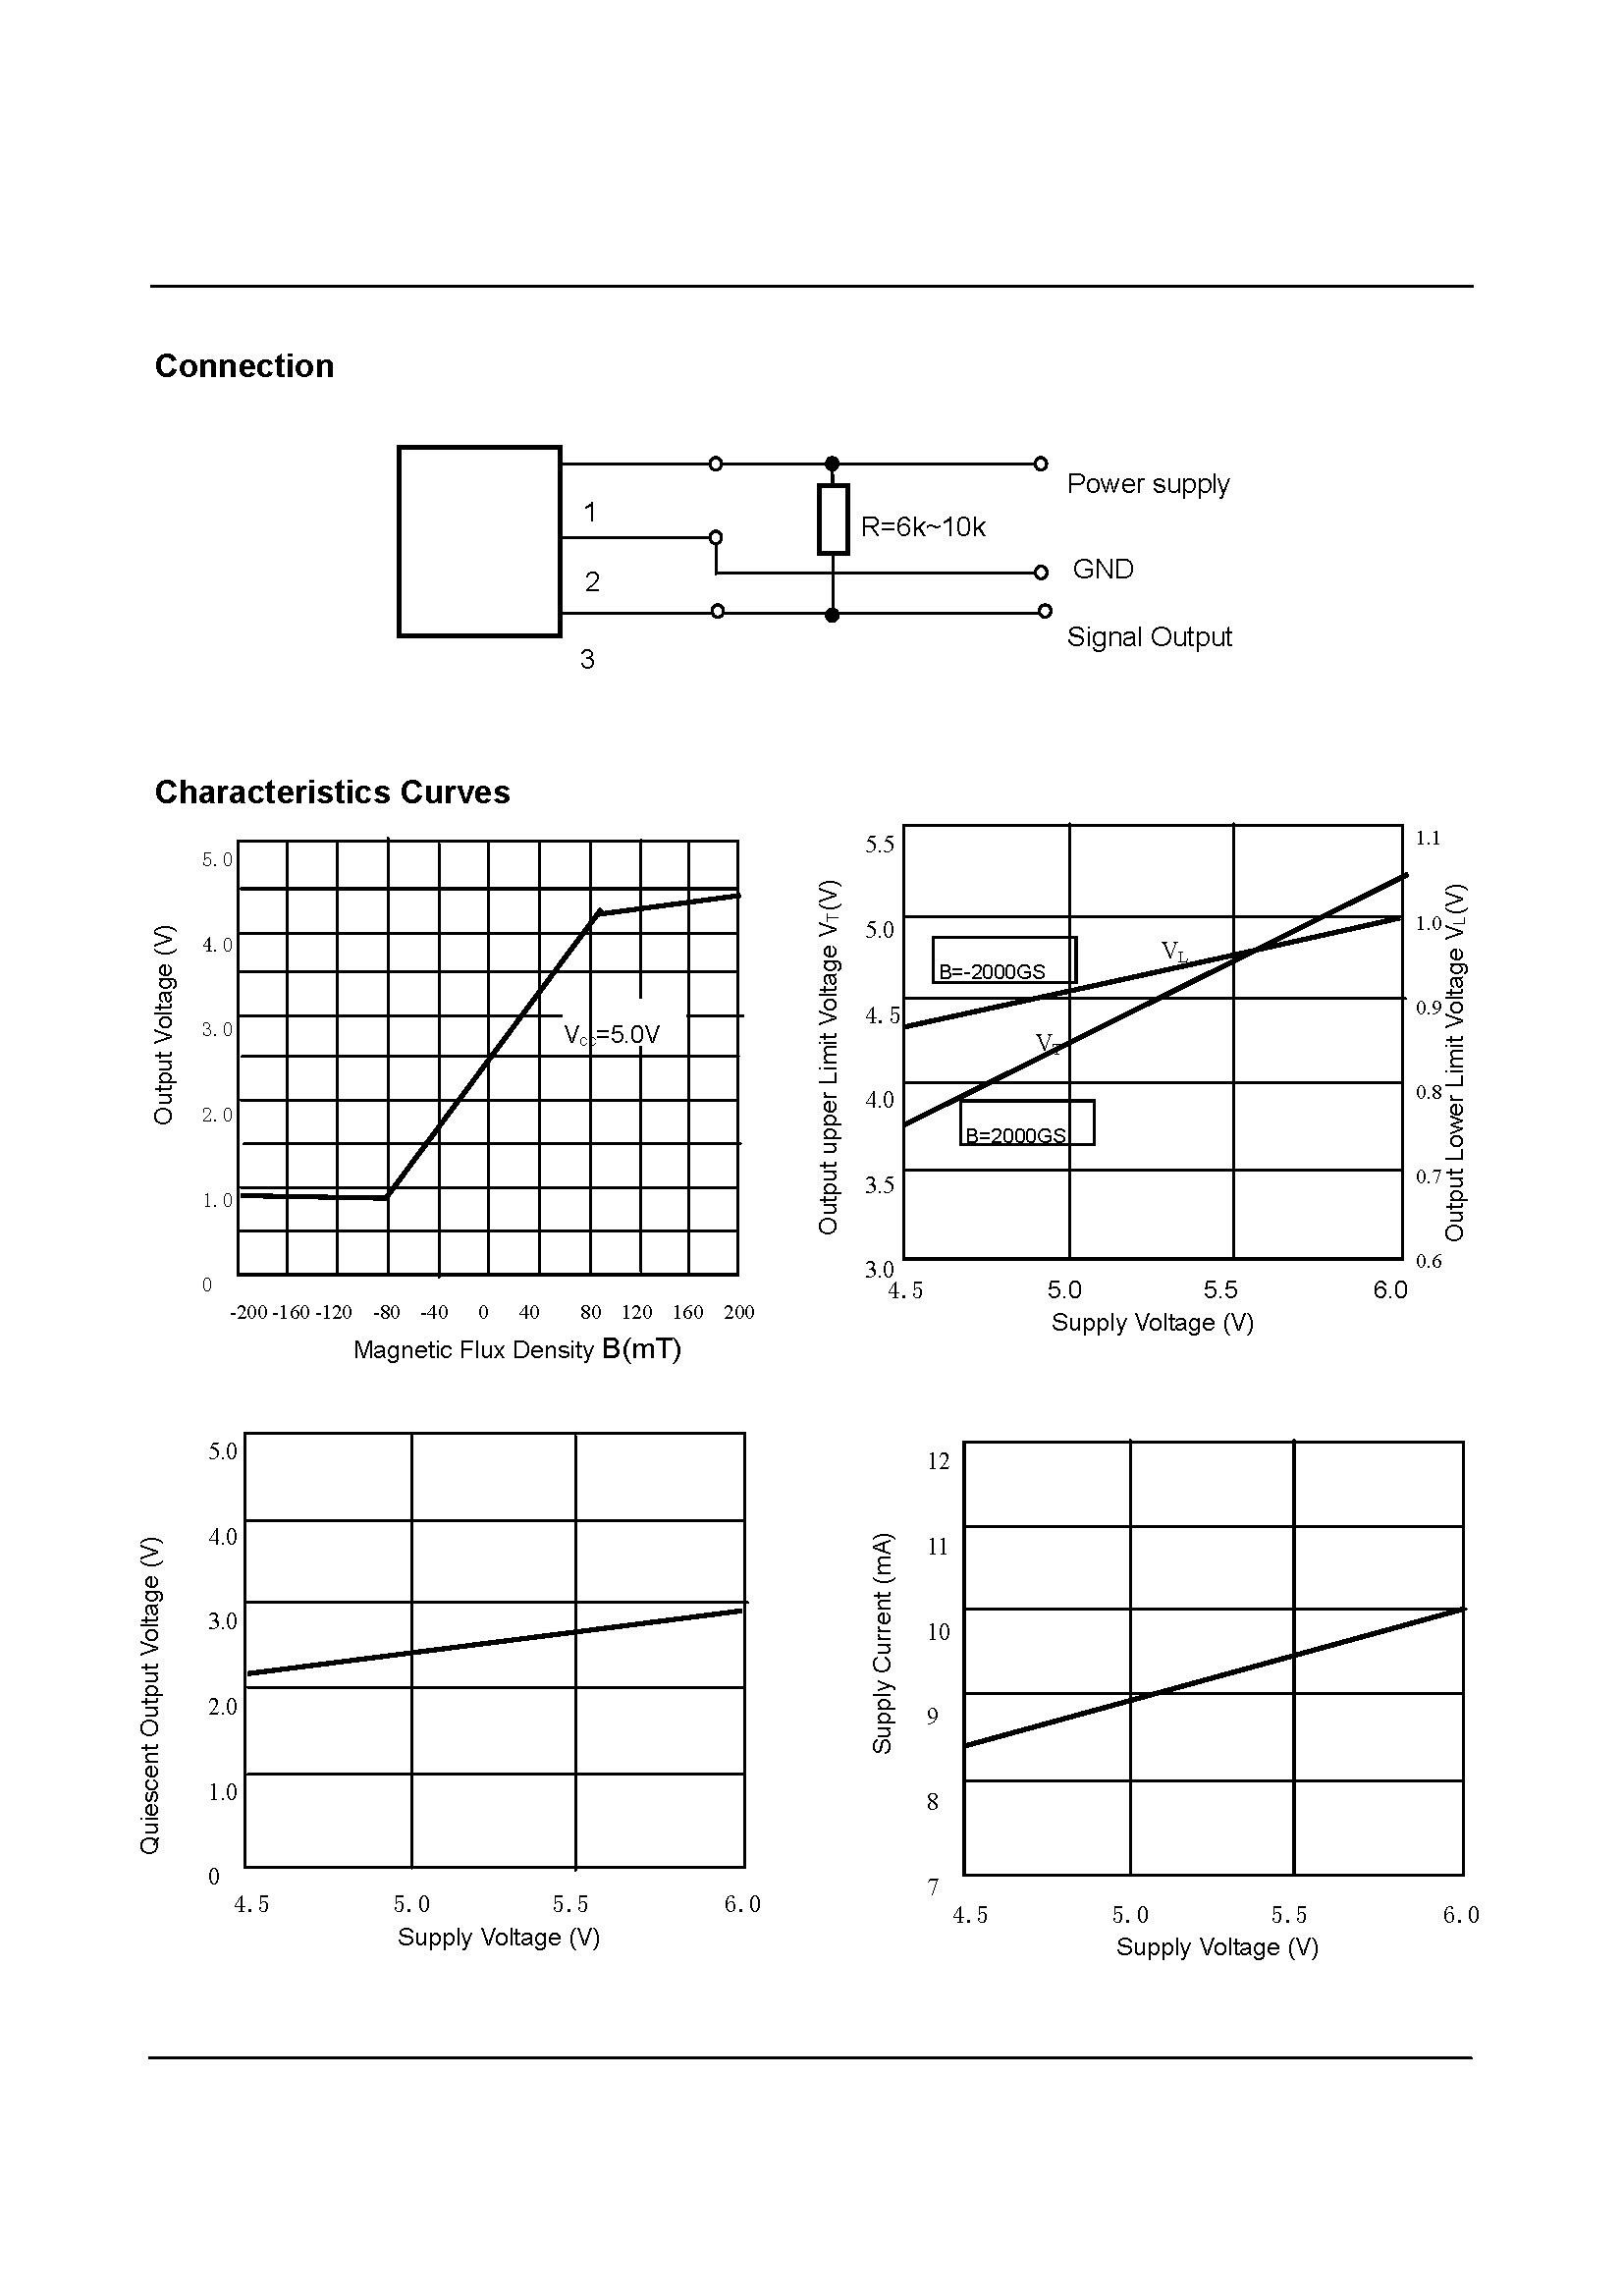 Datasheets Datasheet Datatietoja Komponenteille Hall Anturi Anturit Graphic Equalizer Using La3600 Electronic Circuits And Diagram Speksit Sivu 1